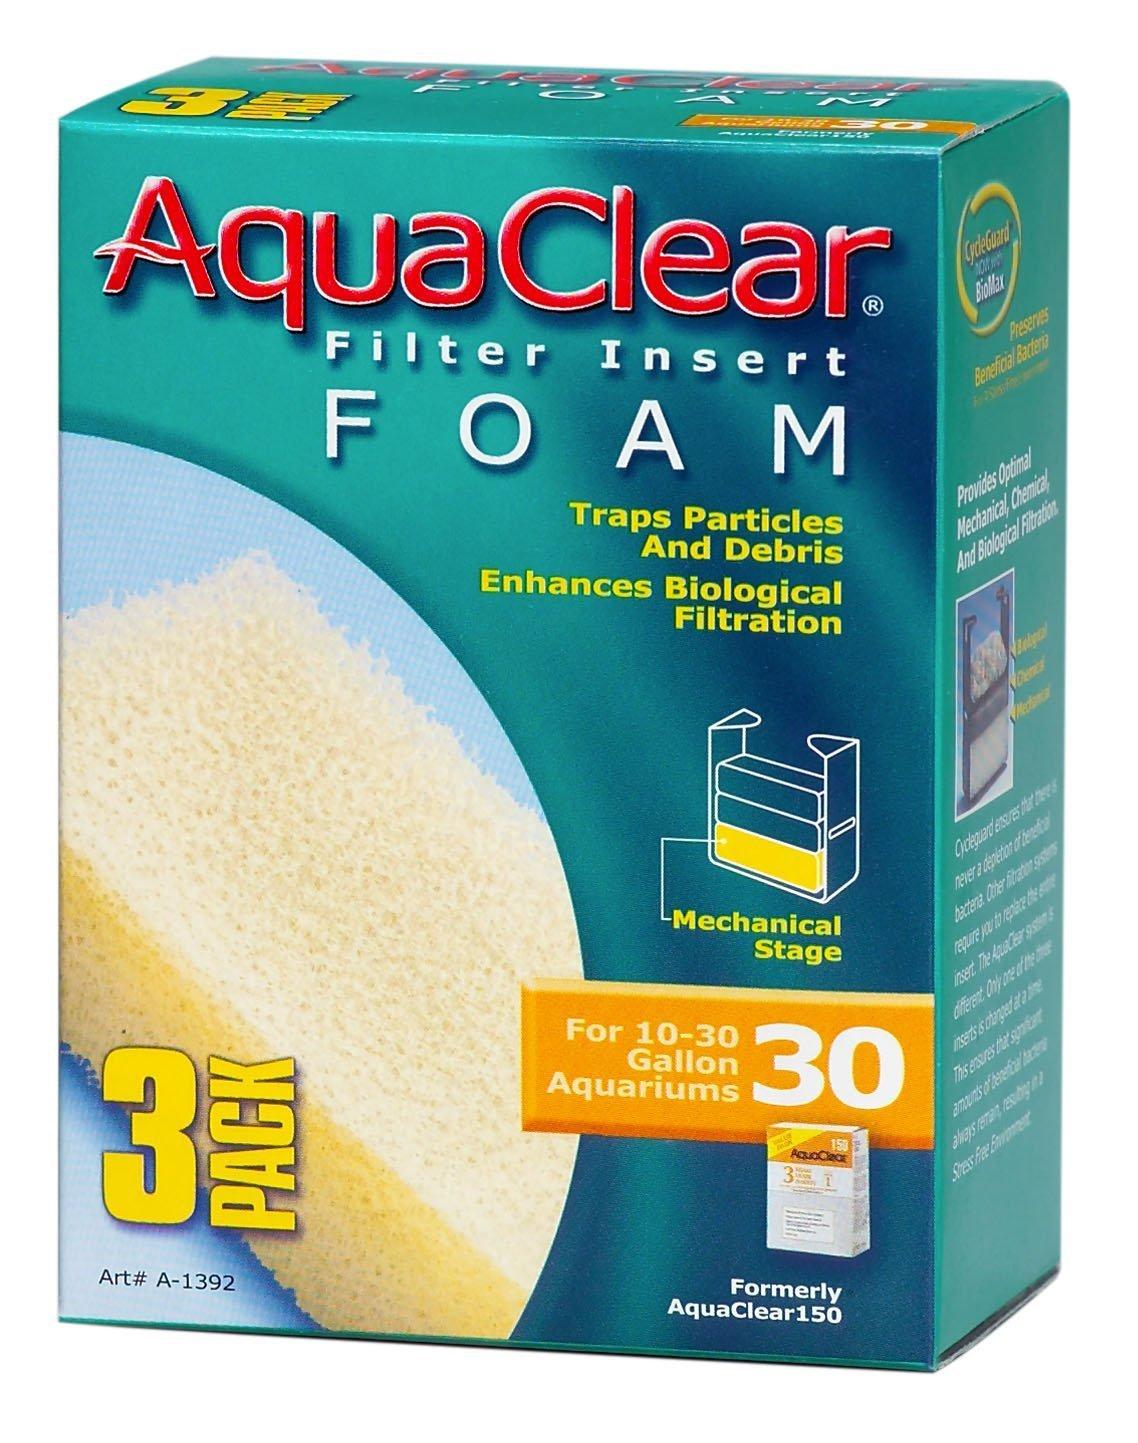 3-Pack Aquaclear Foam Filter Inserts for 5 to 20 Gallon Aquariums